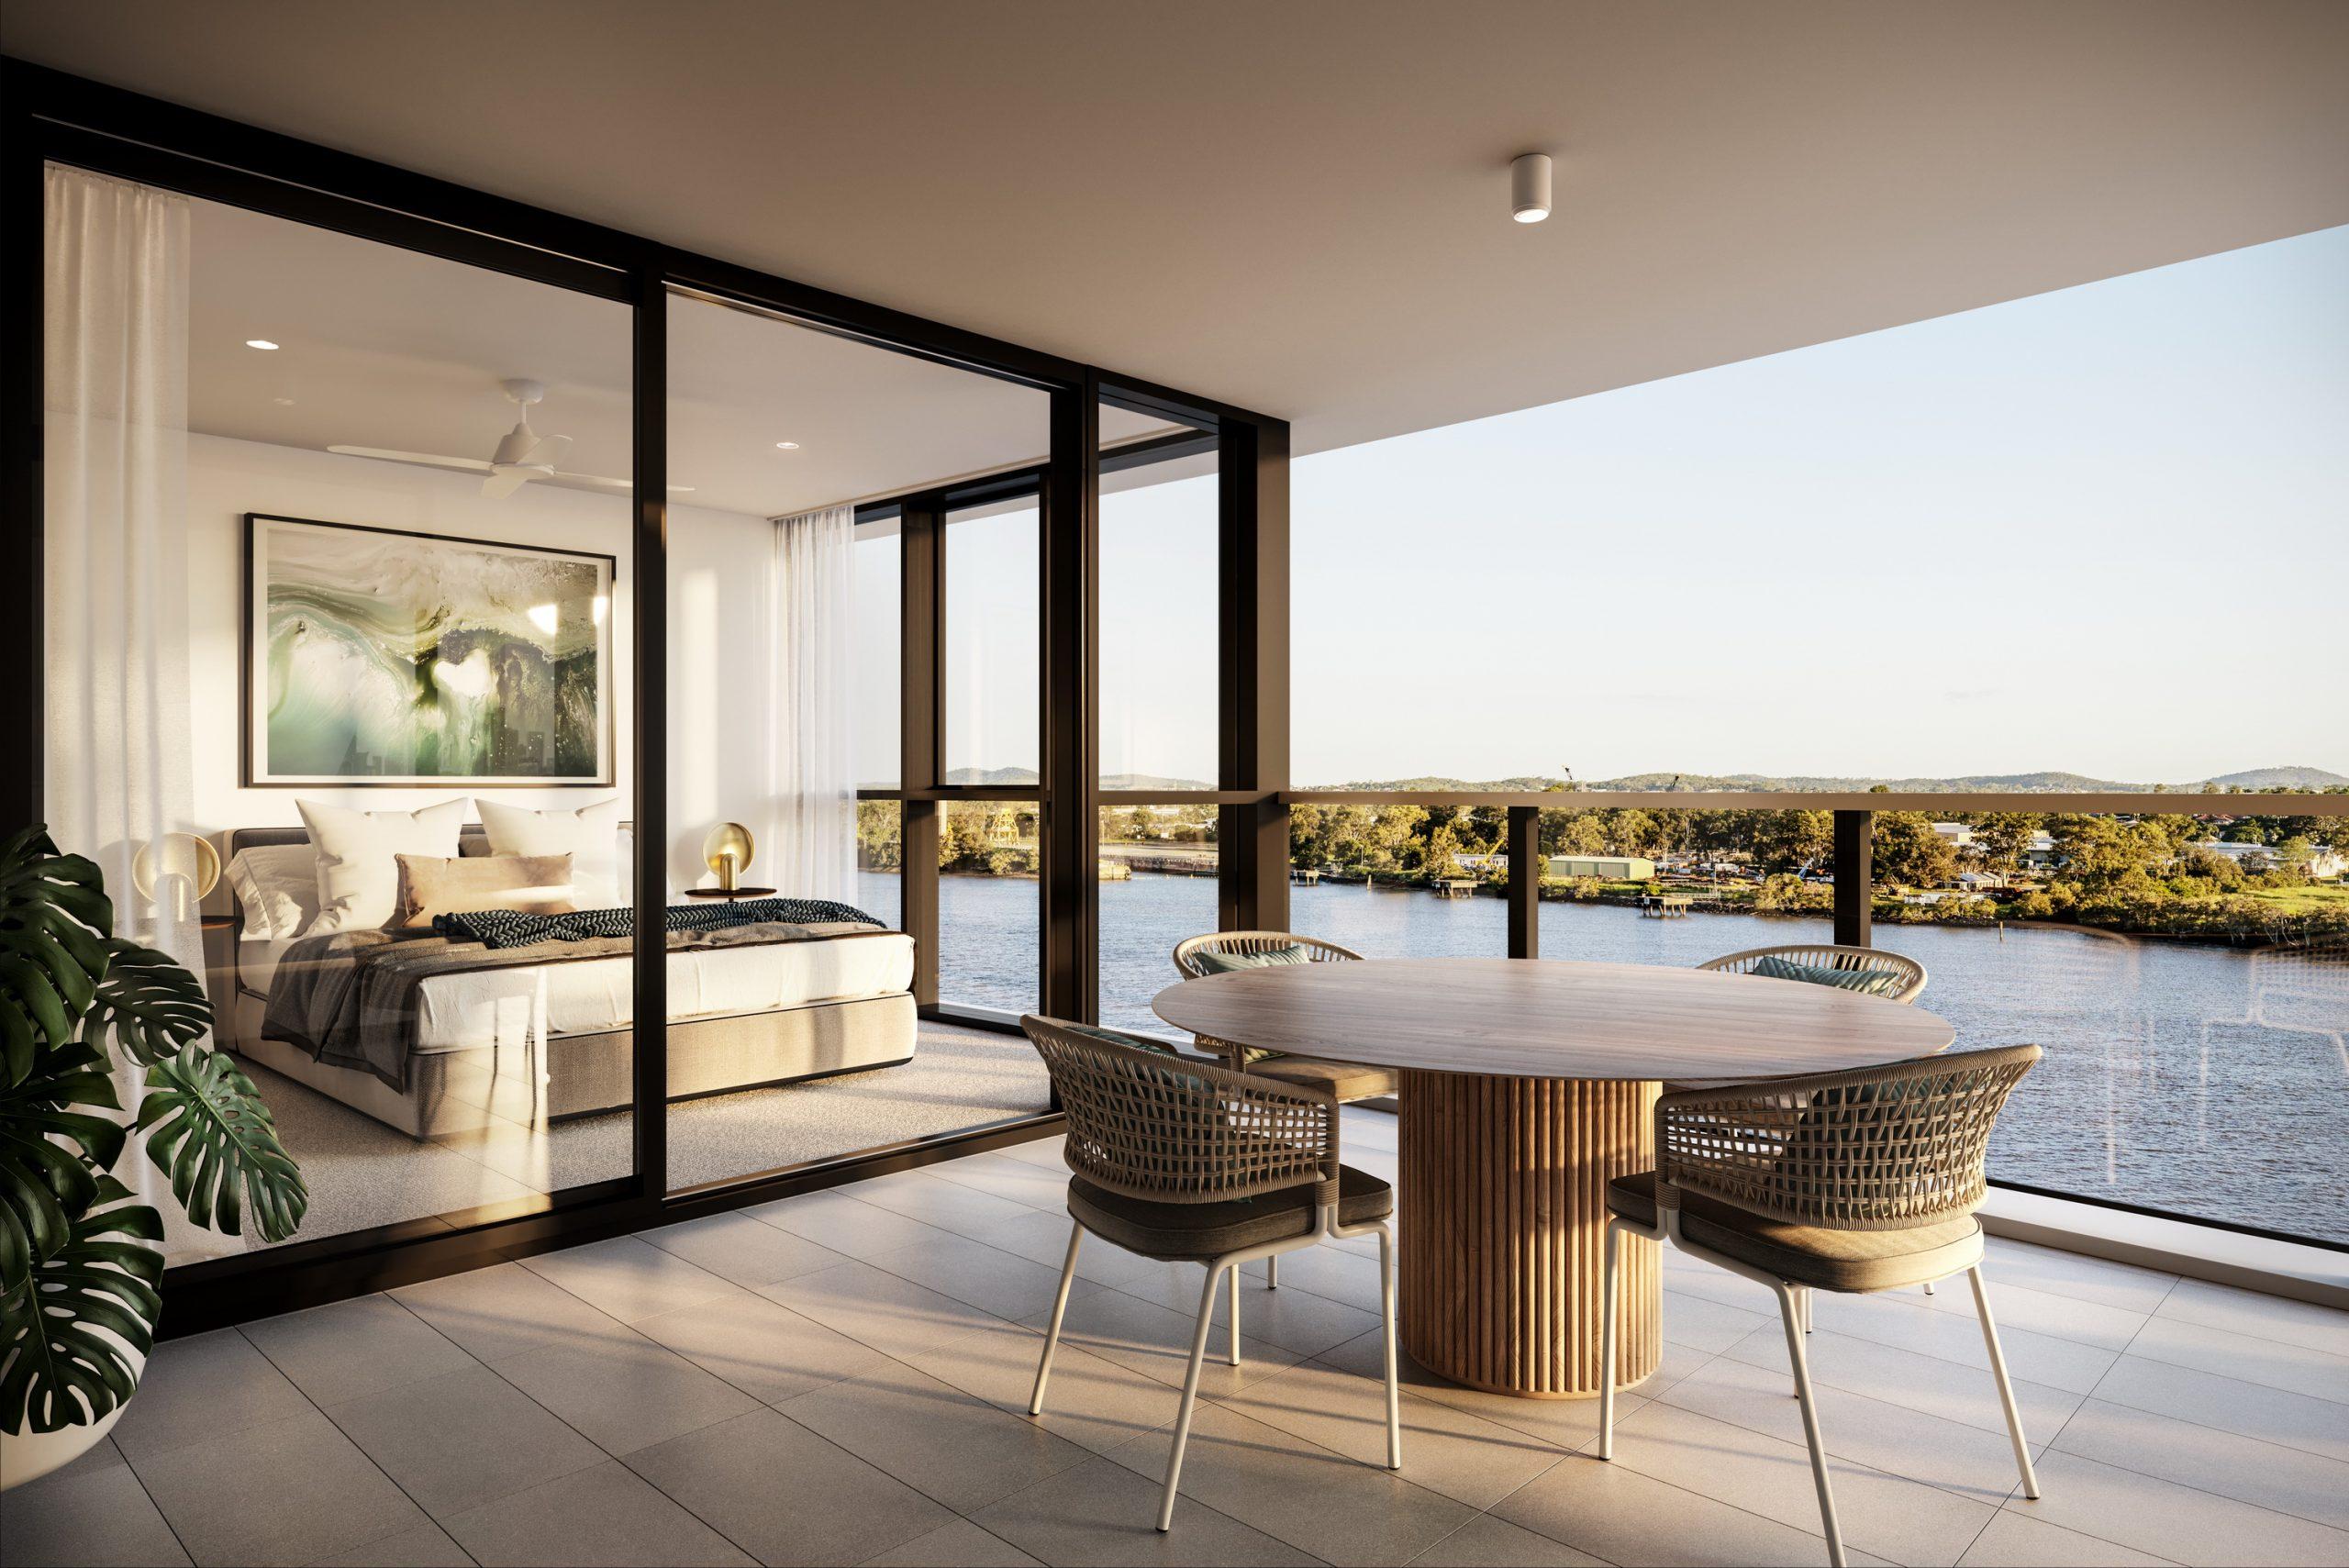 render-fkd-studio-penthouse-rivello-design-3d-bedroom